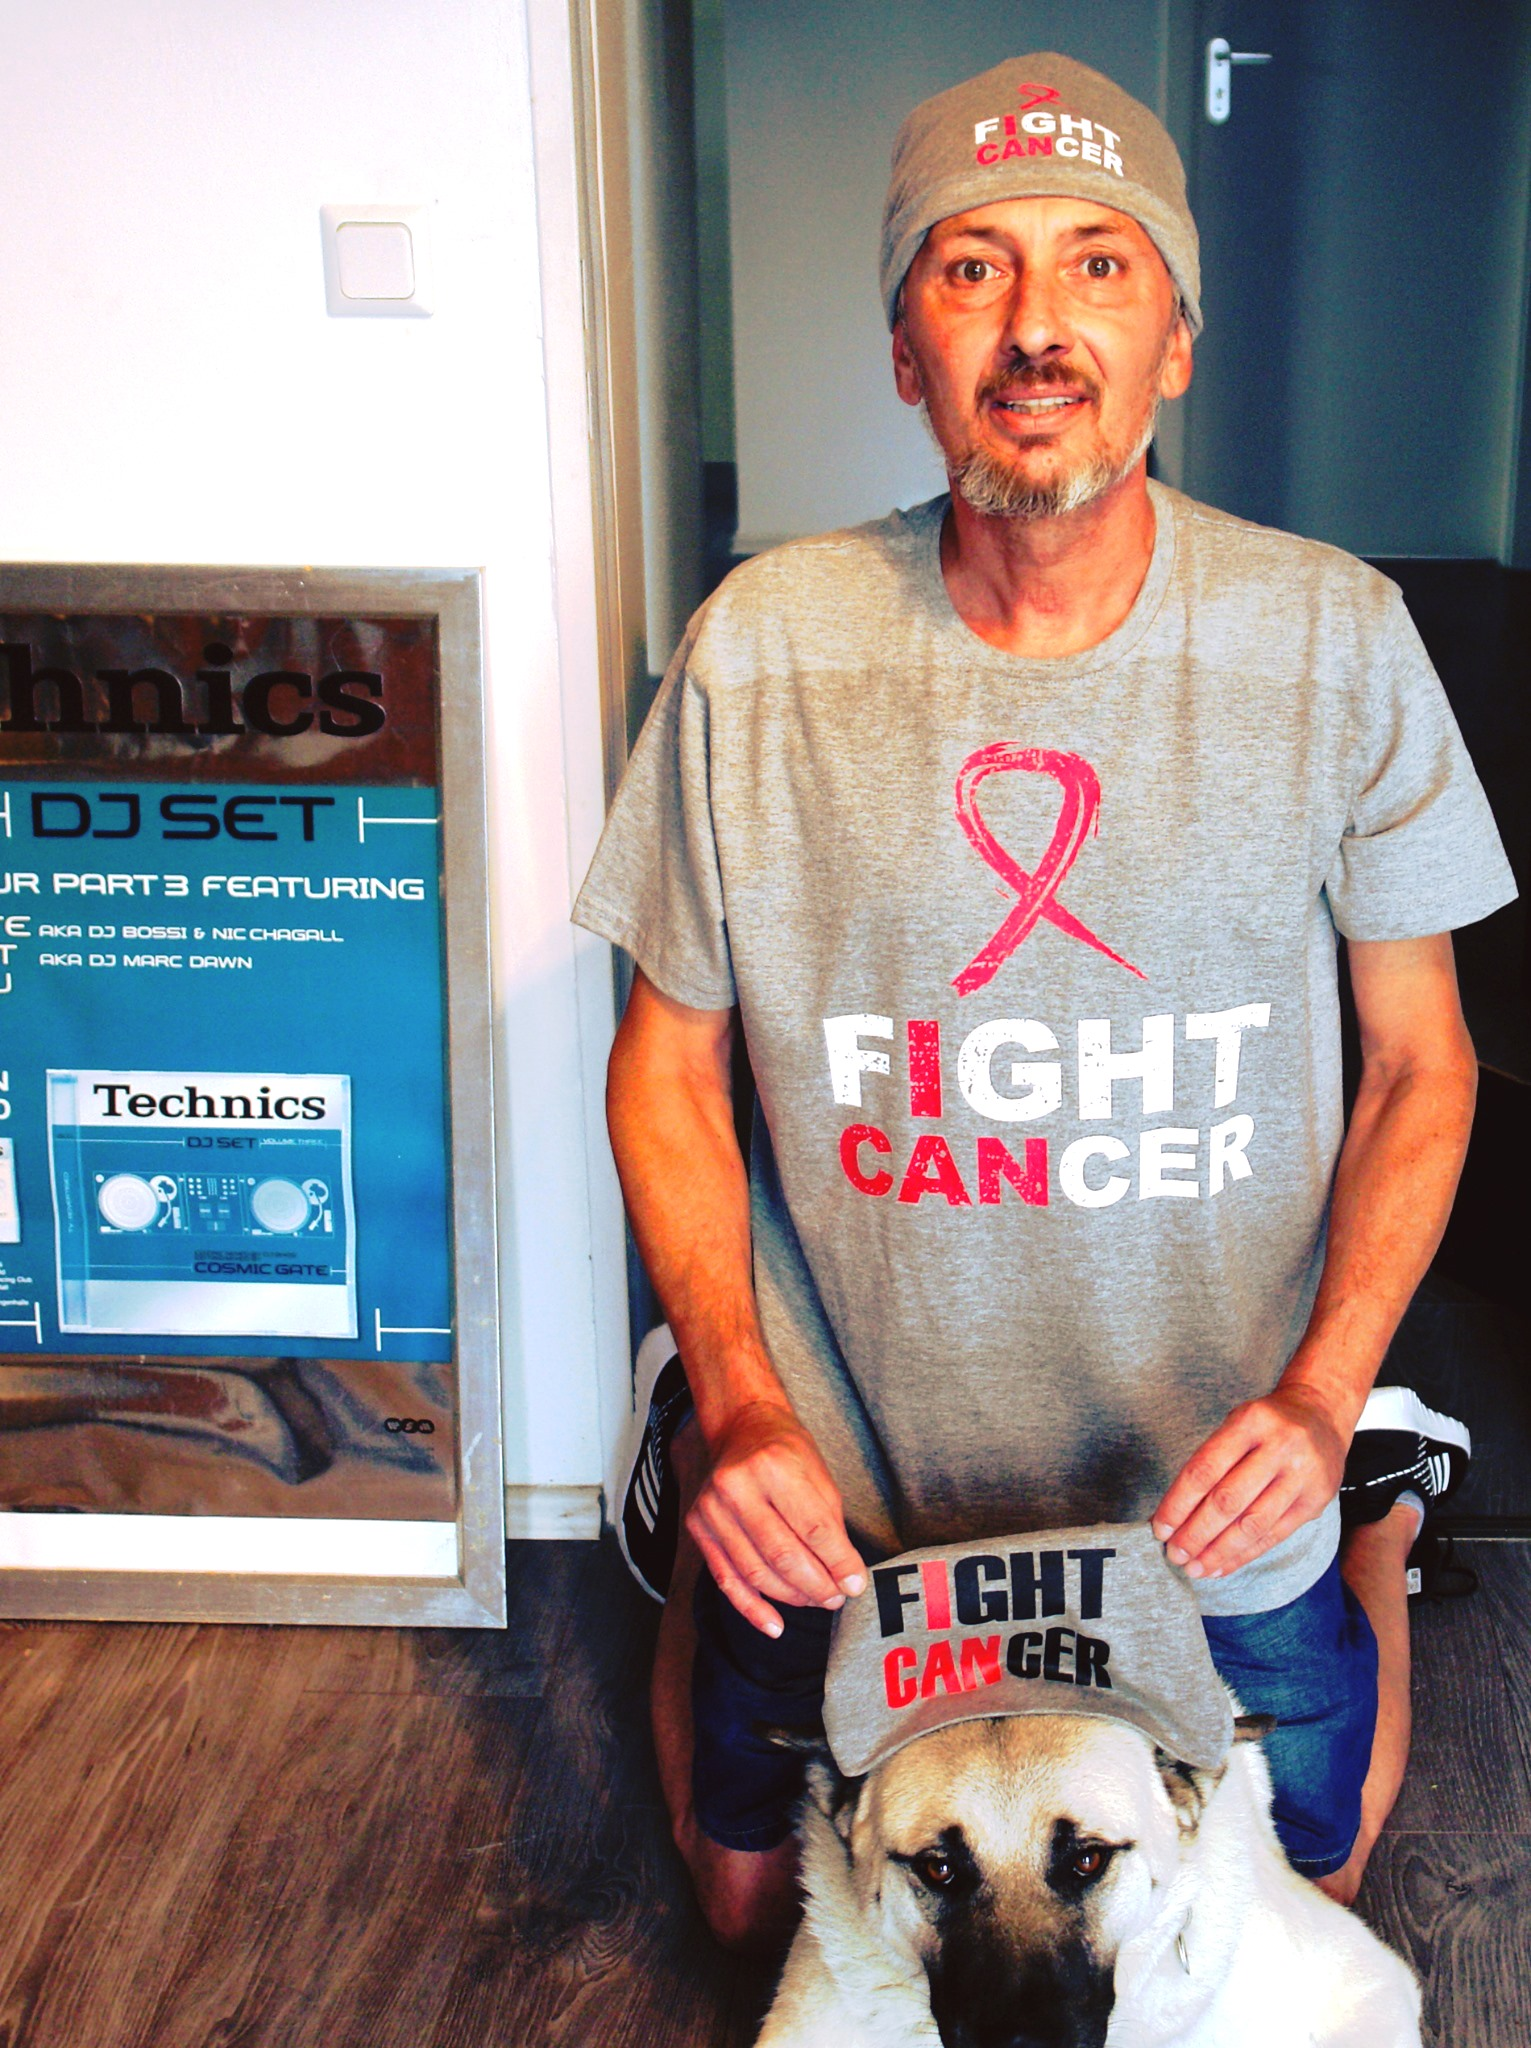 Michael Urgacz aka Beam kaempft oeffentlicht gegen Krebserkranknung